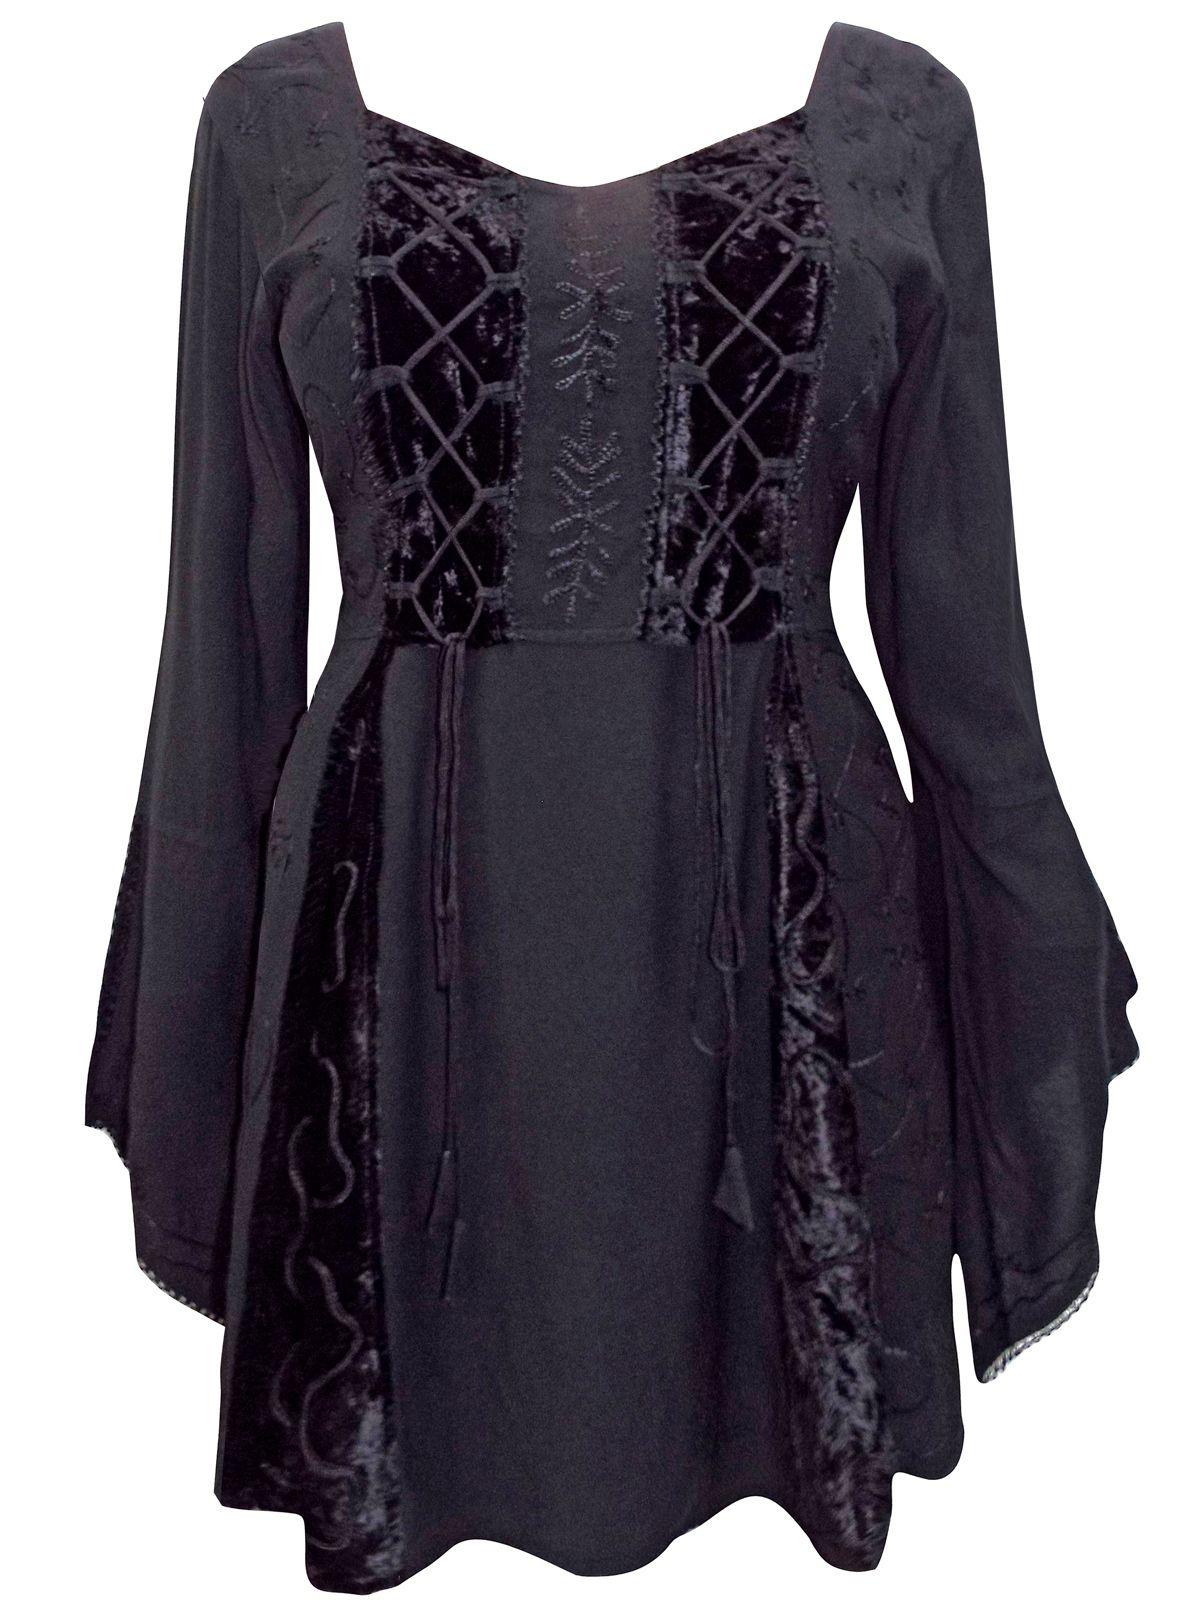 6acddf5afec eaonplus BLACK Embroidered Renaissance Gothic Corset Tunic Top - Plus Size  18 20